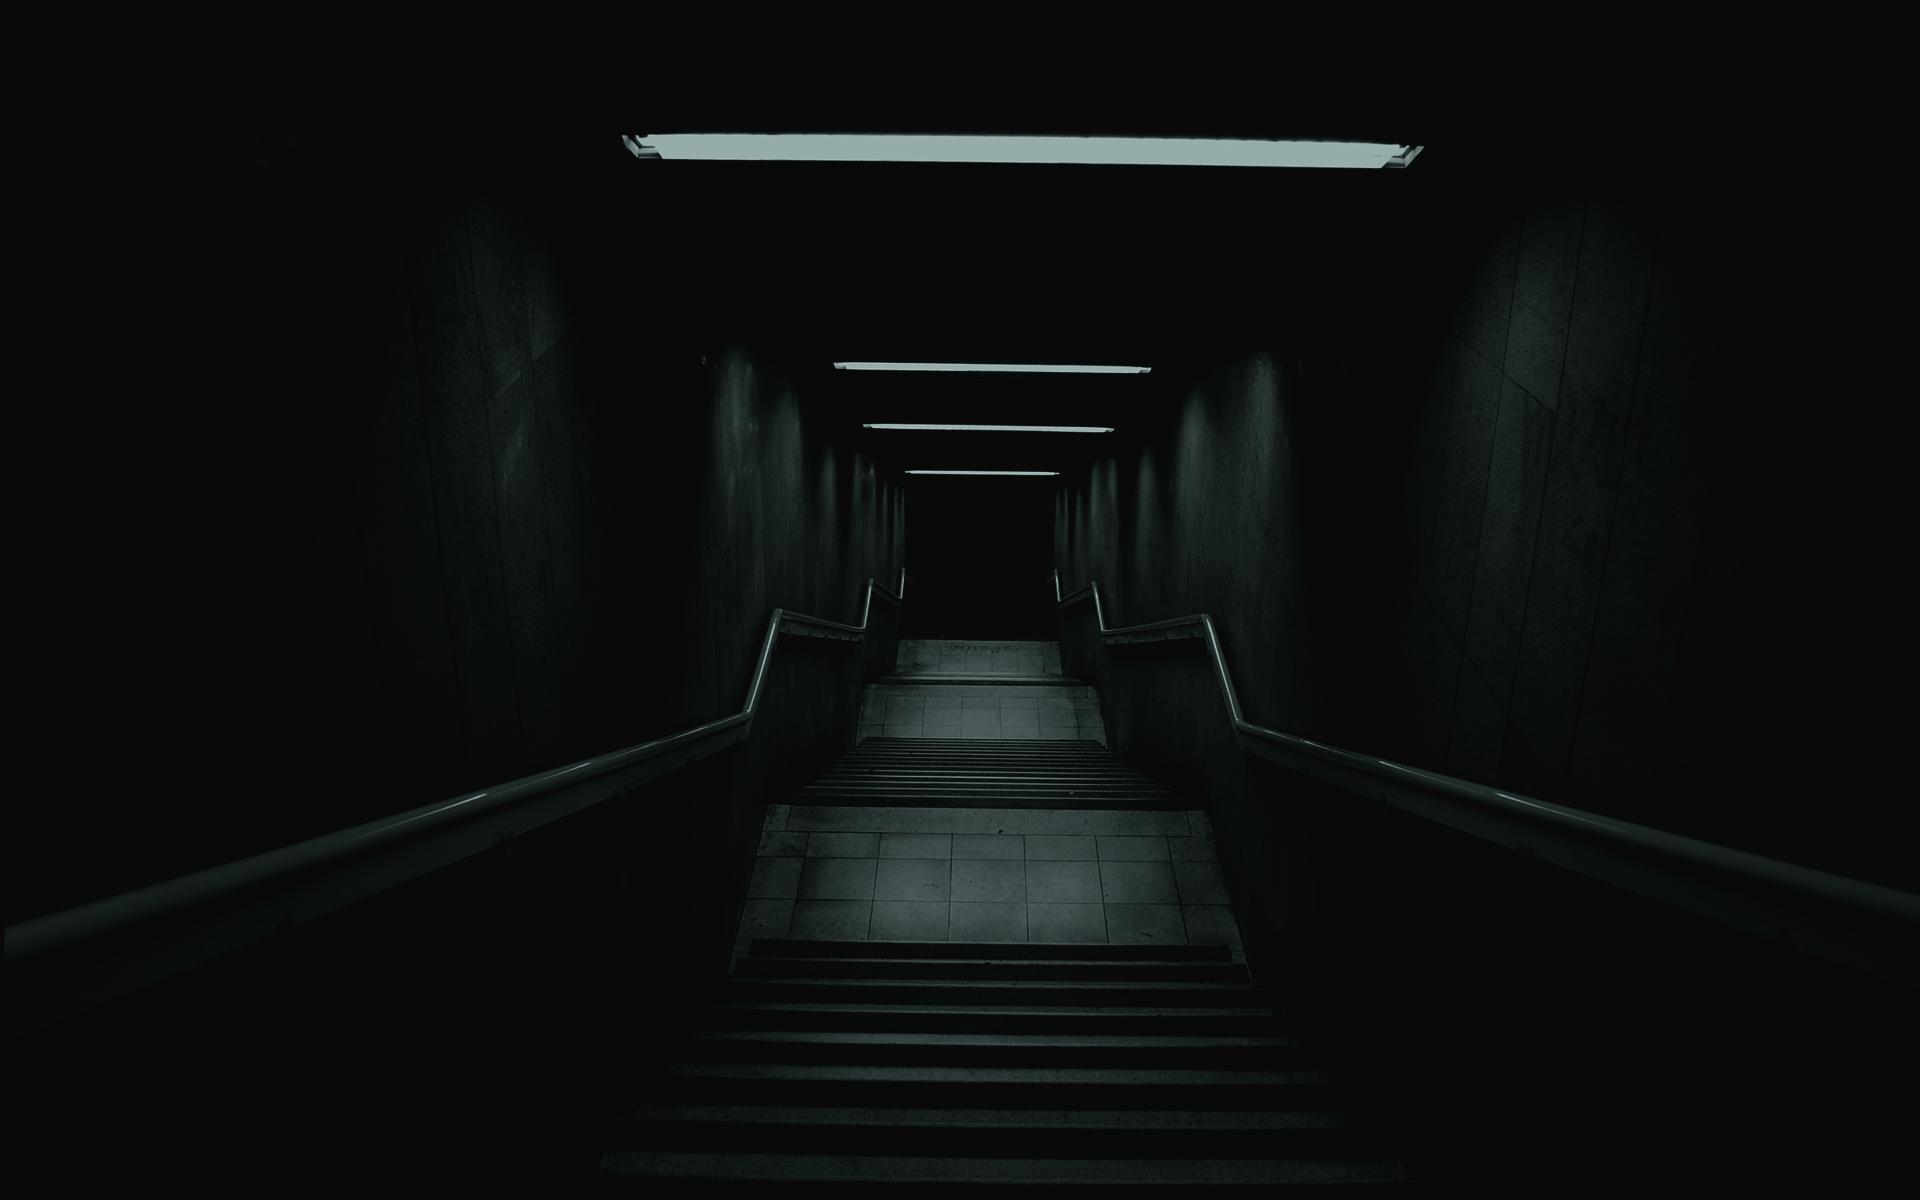 Magnificent Dark Wallpapers Background For Desktop 1920x1200